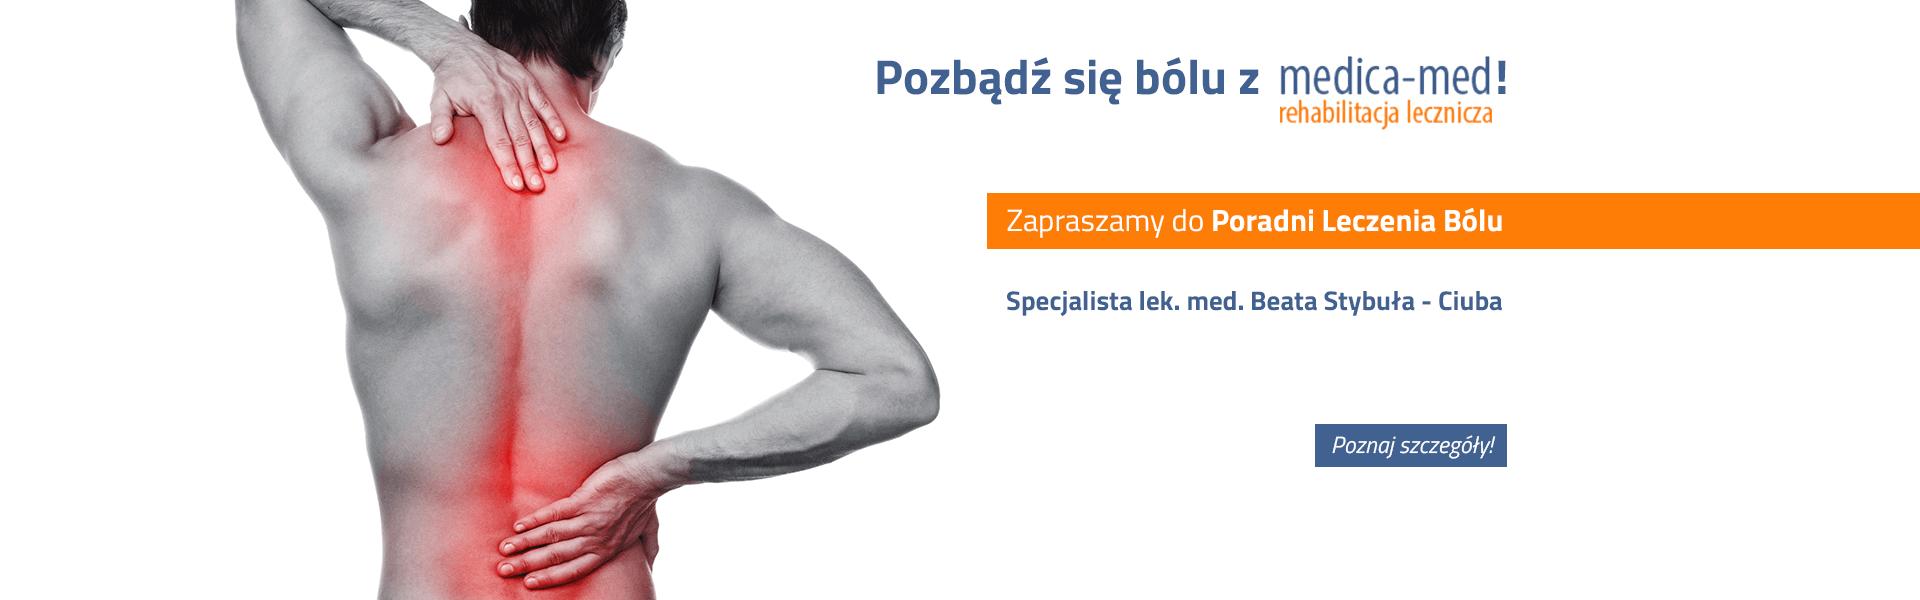 Medicamed pozbąź się bólu (1)